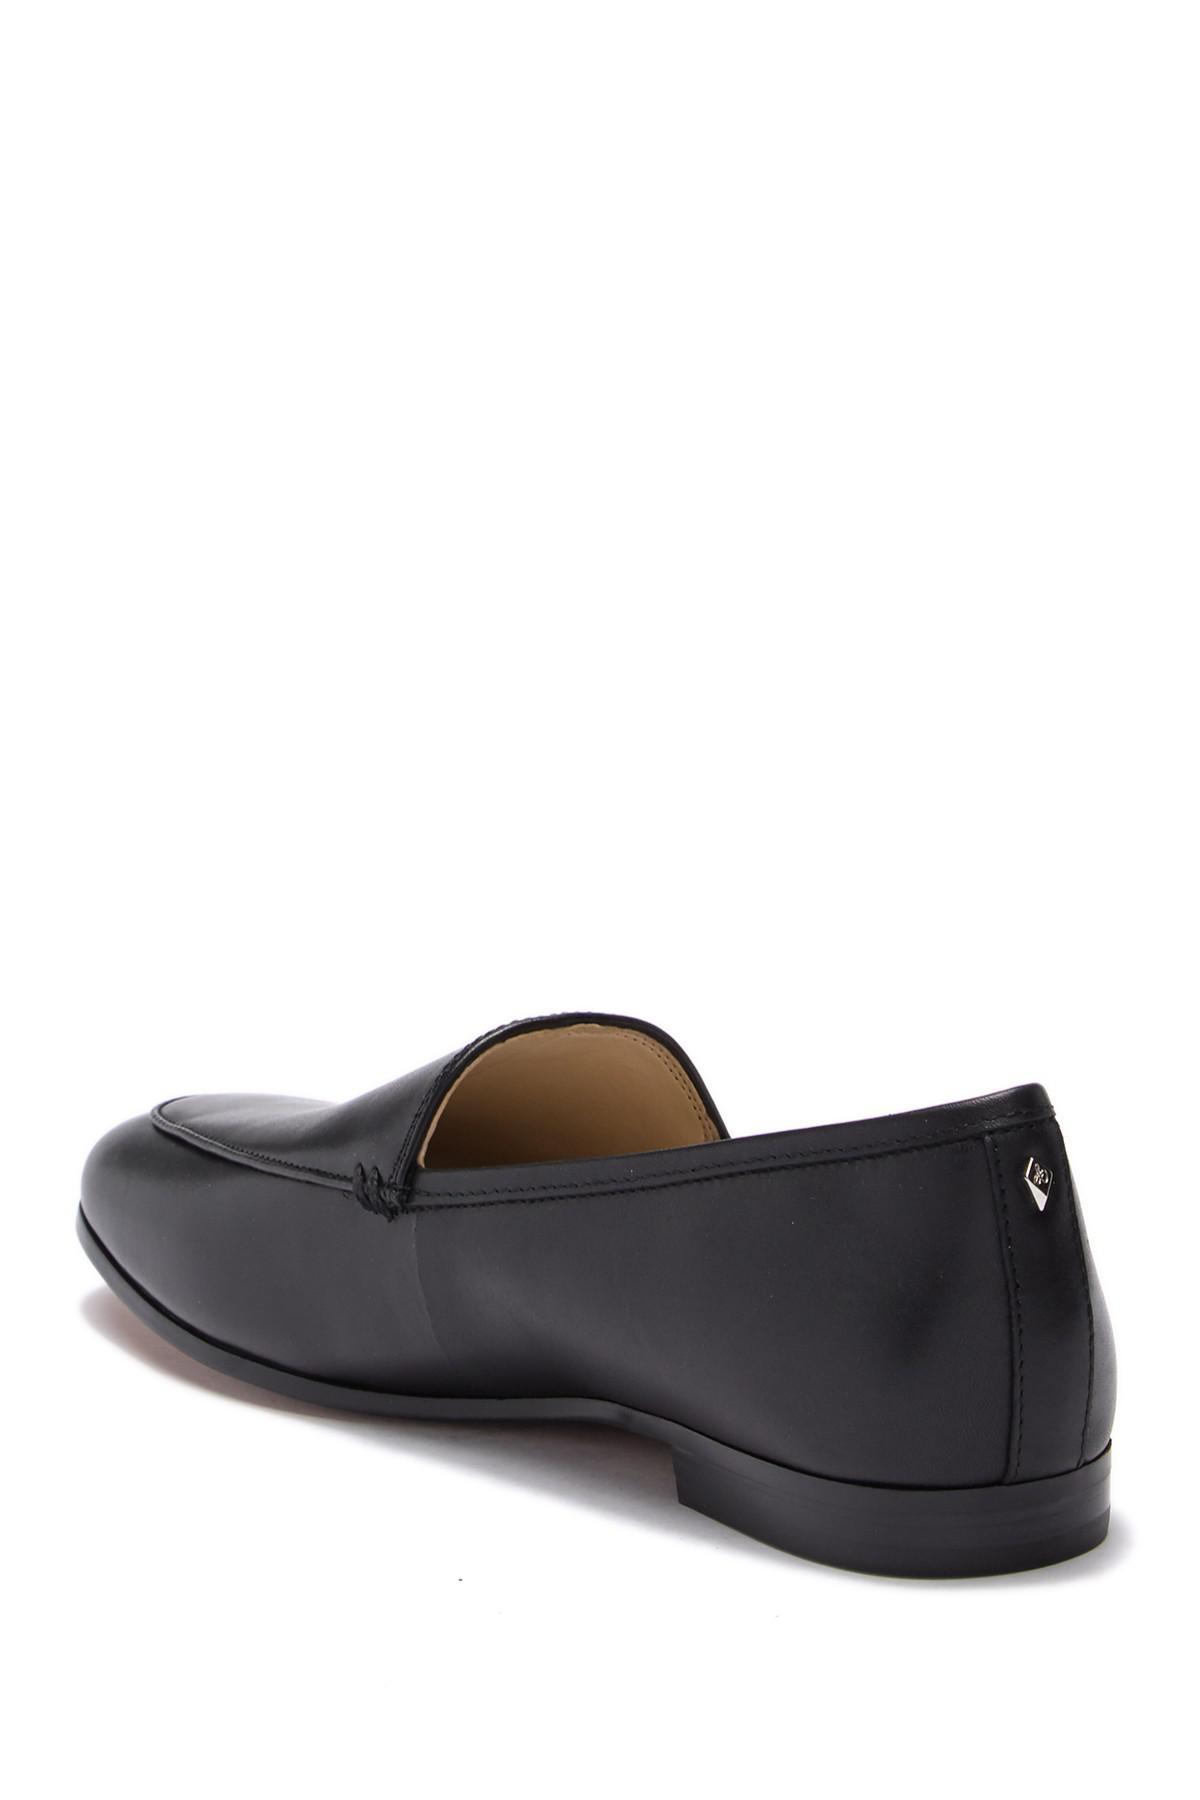 ee8a417c56e6d Lyst - Sam Edelman Leon Flat in Black